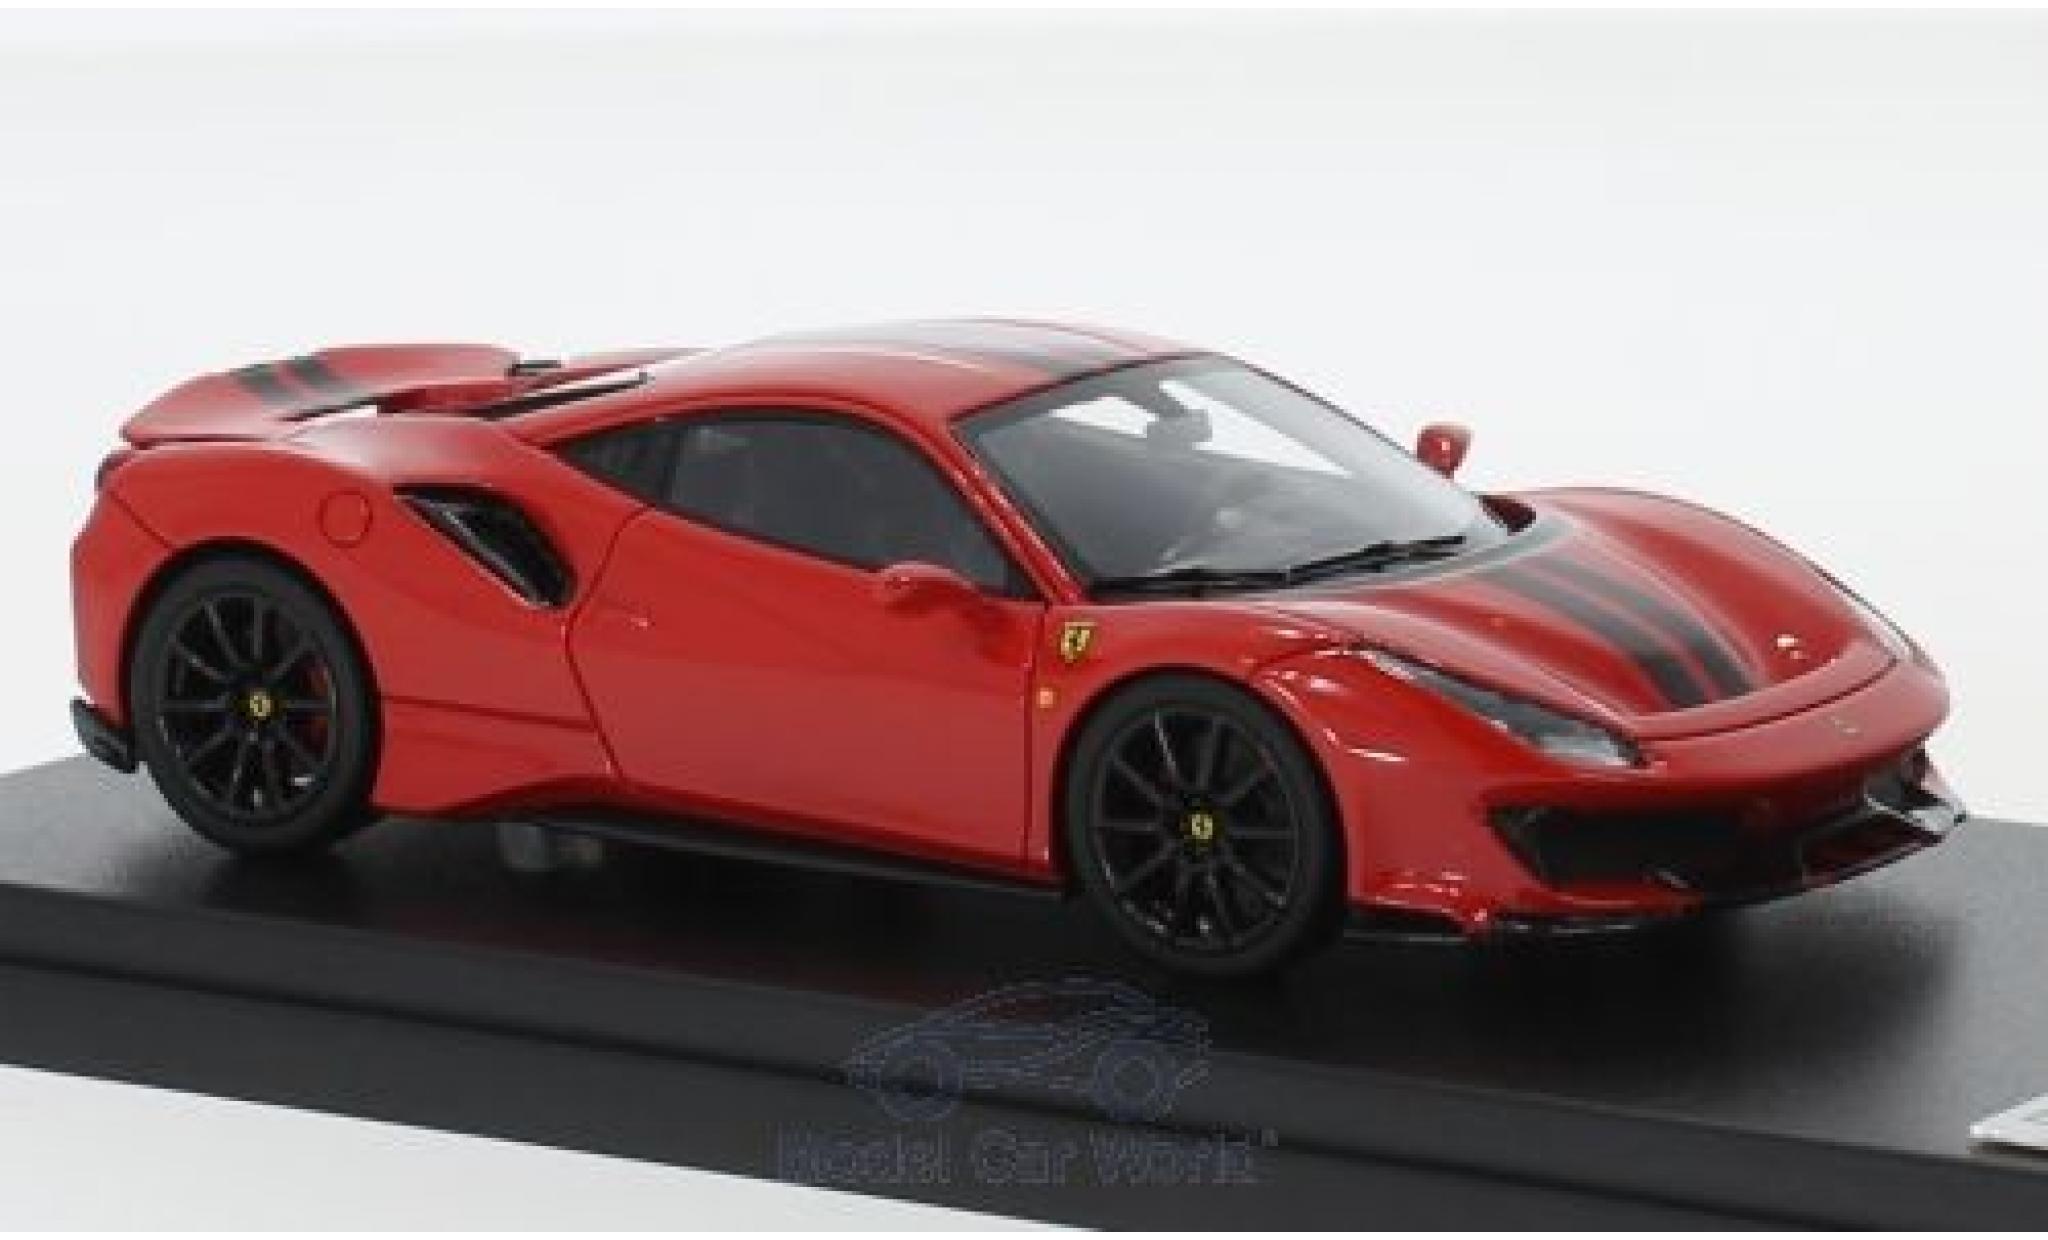 Ferrari 488 1/43 Look Smart Pista red/black 2018